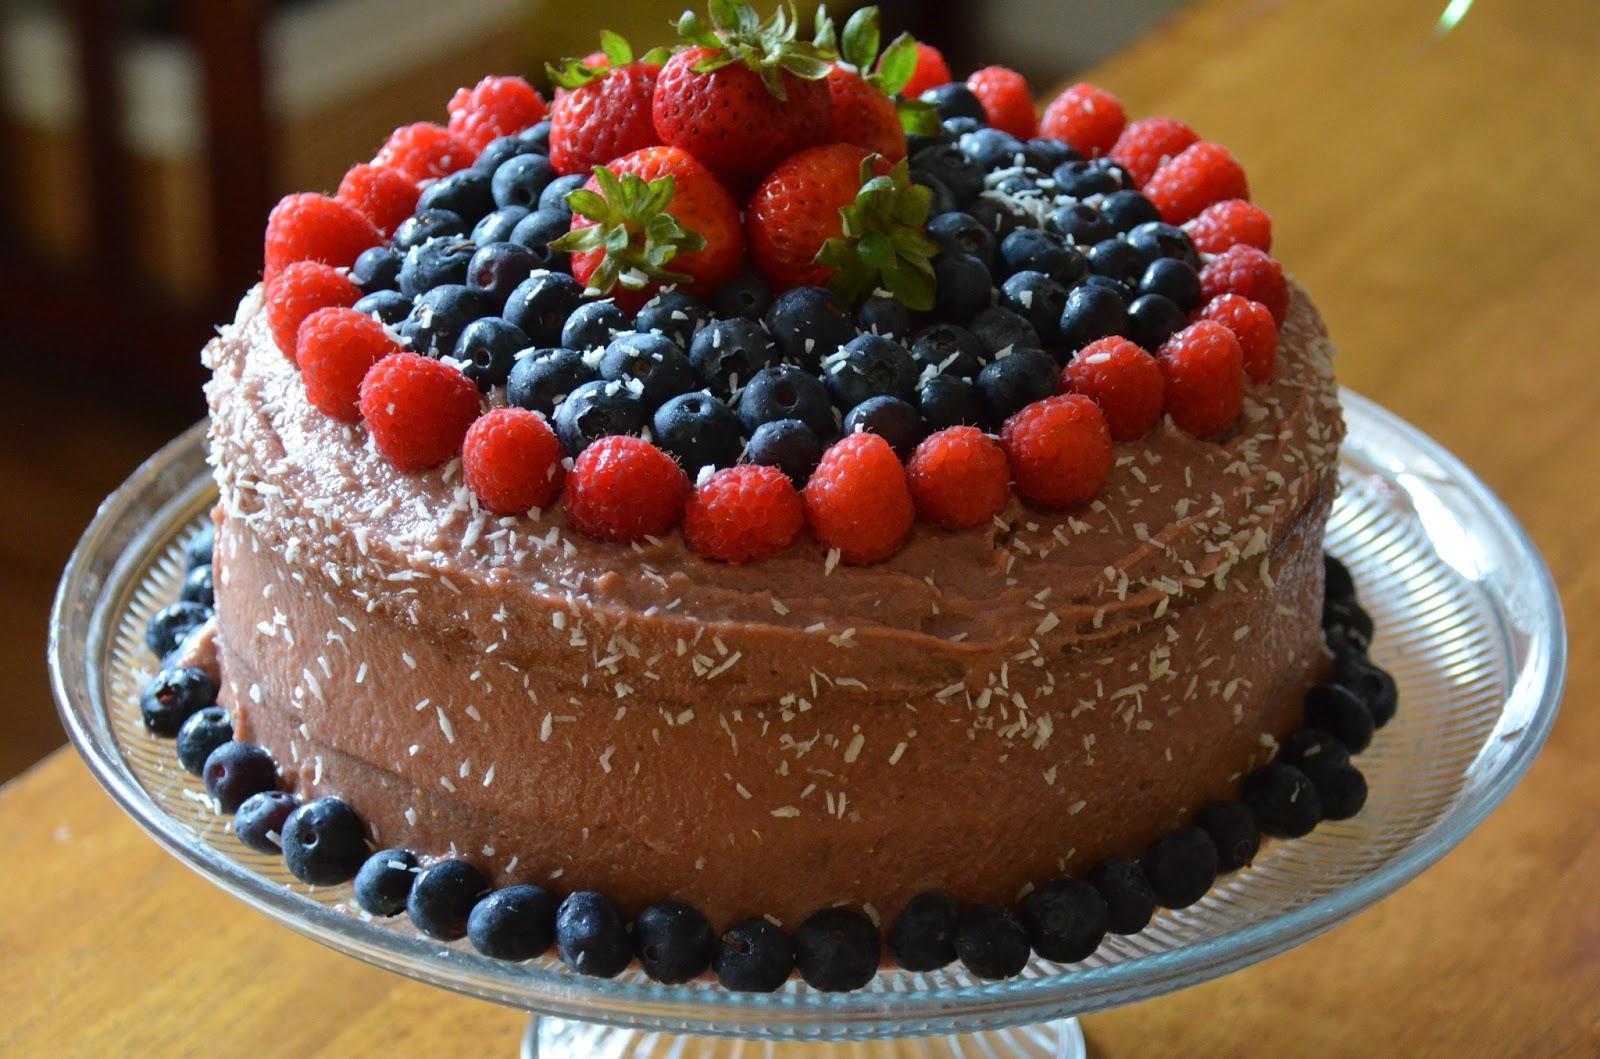 Superb 9 Tasty Sugar Free Cakes Photo Sugar Free Chocolate Dessert Funny Birthday Cards Online Elaedamsfinfo